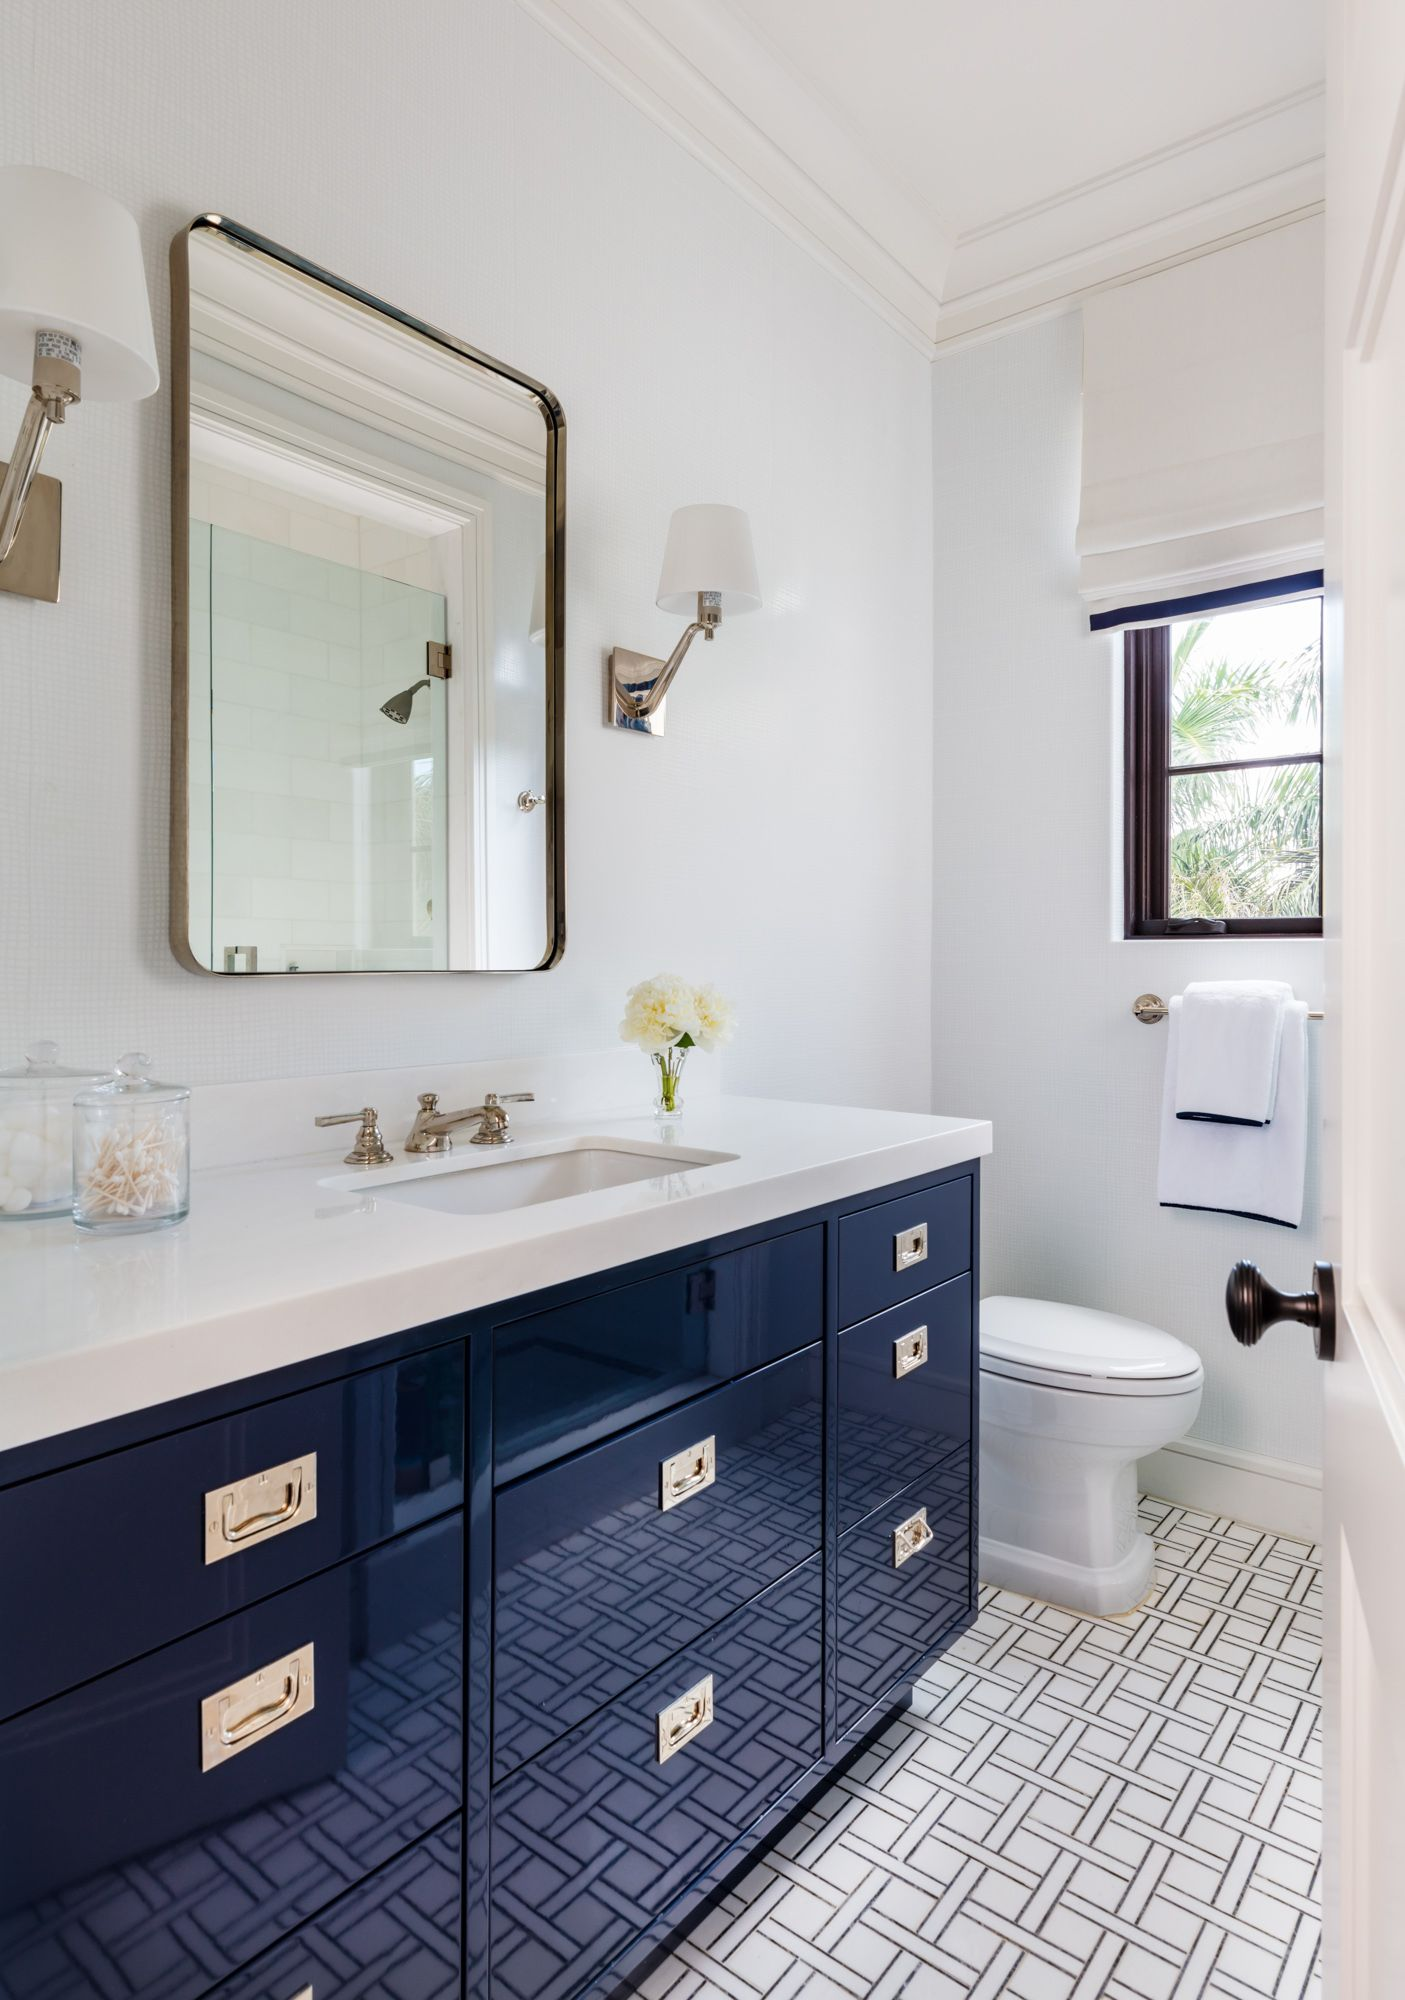 Navy Blue High Gloss Vanity Basketweave Floor Tile Rounded Rectangular Vanity Mirror Mccann Design Group Vanity Blue Tile Floor New Ravenna [ 2000 x 1405 Pixel ]